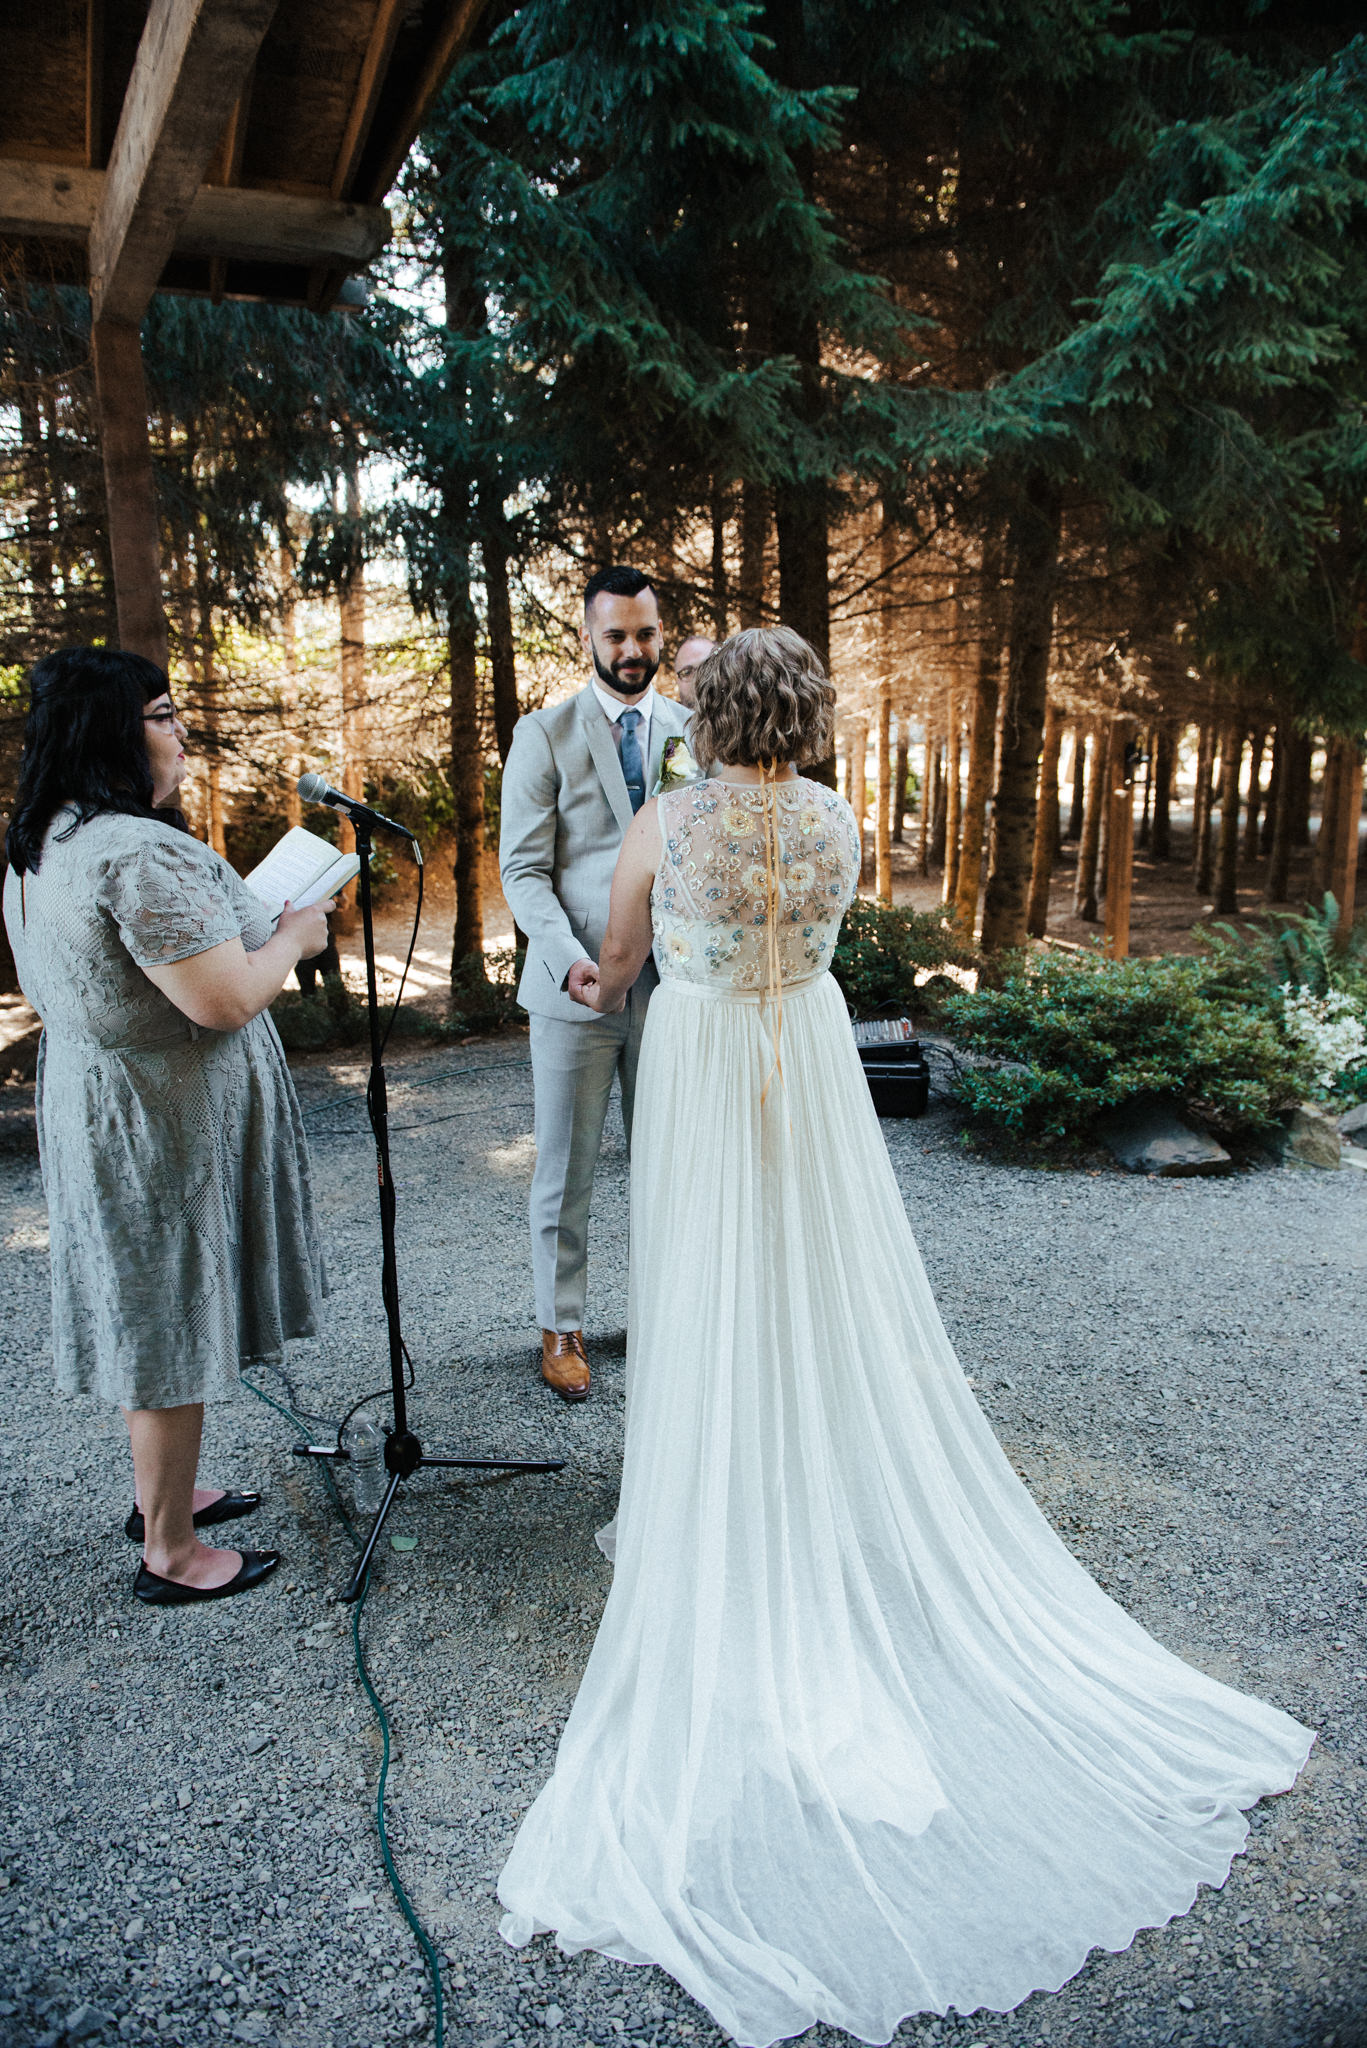 Amy Steven Seattle Wedding Photographer Vishal Goklani_042.jpg